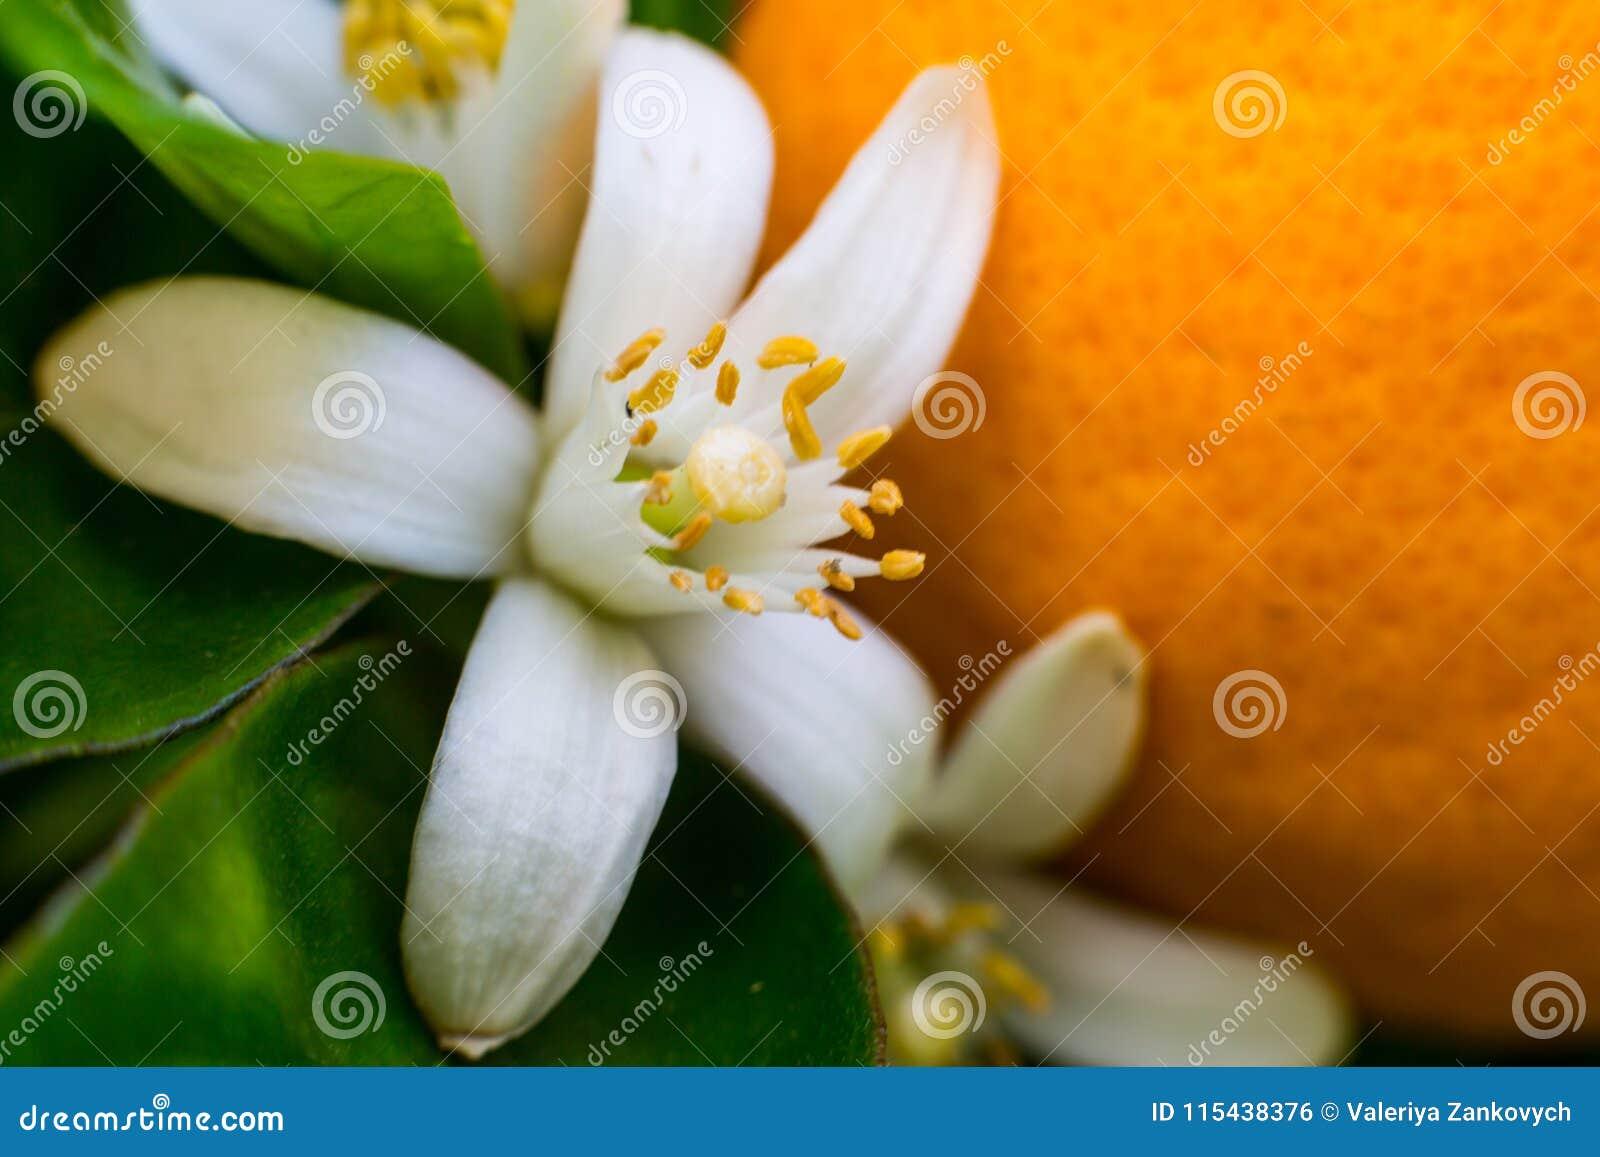 Neroli 绿色明亮的橙树叶子和橙色花neroli与雨珠,露水背景